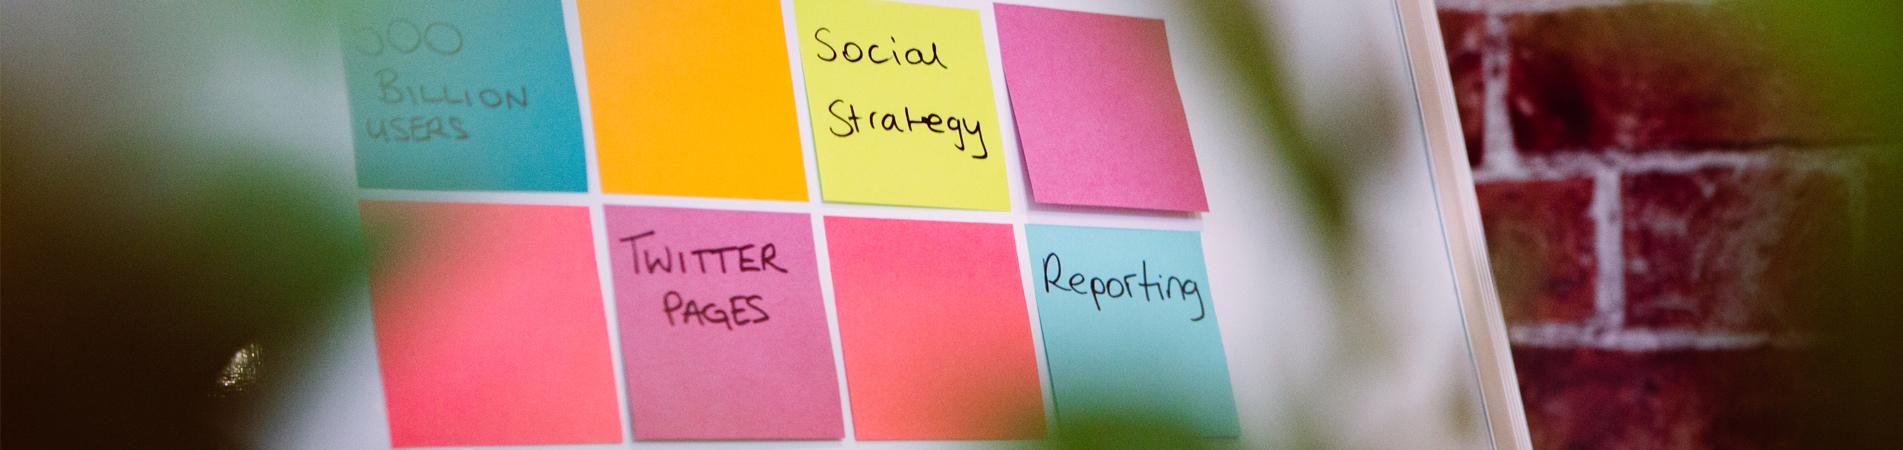 Isn't social media free? Why should you pay for social media marketing?